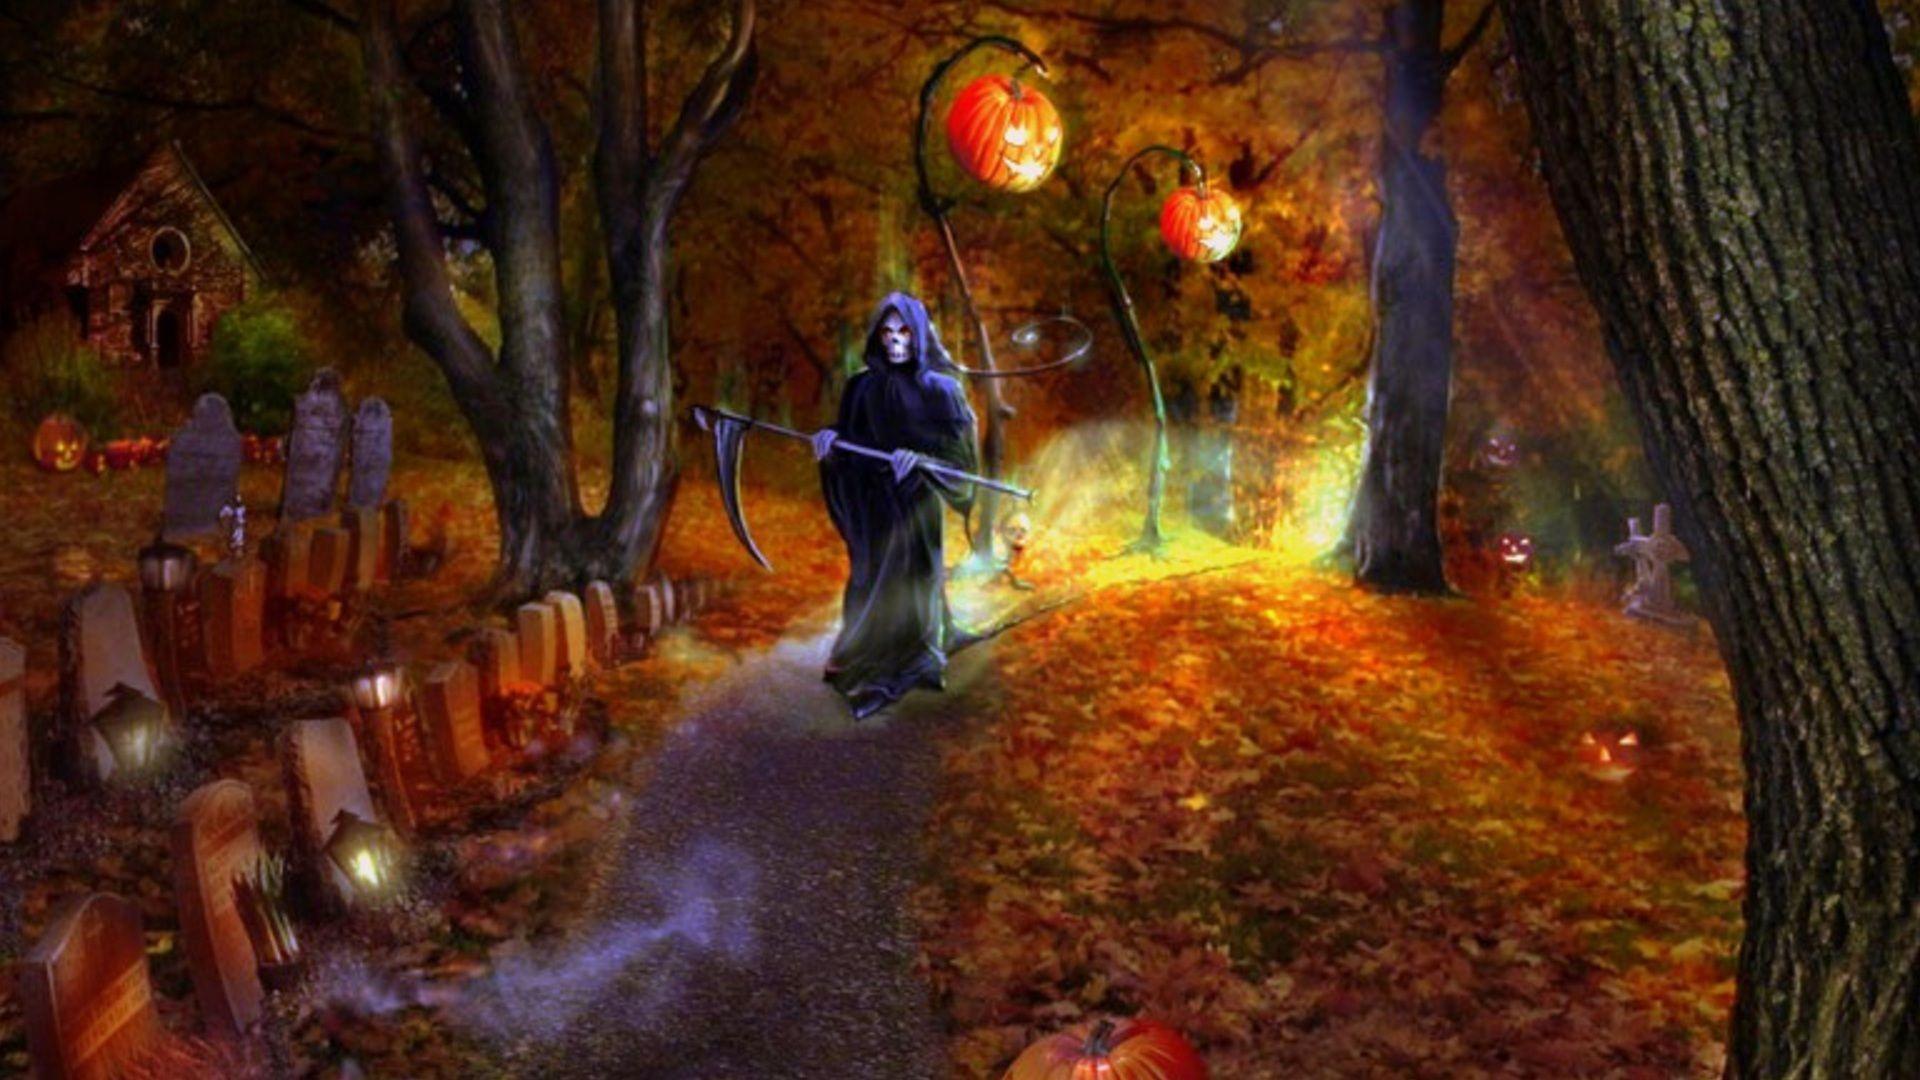 halloween wallpapers free - photo #35